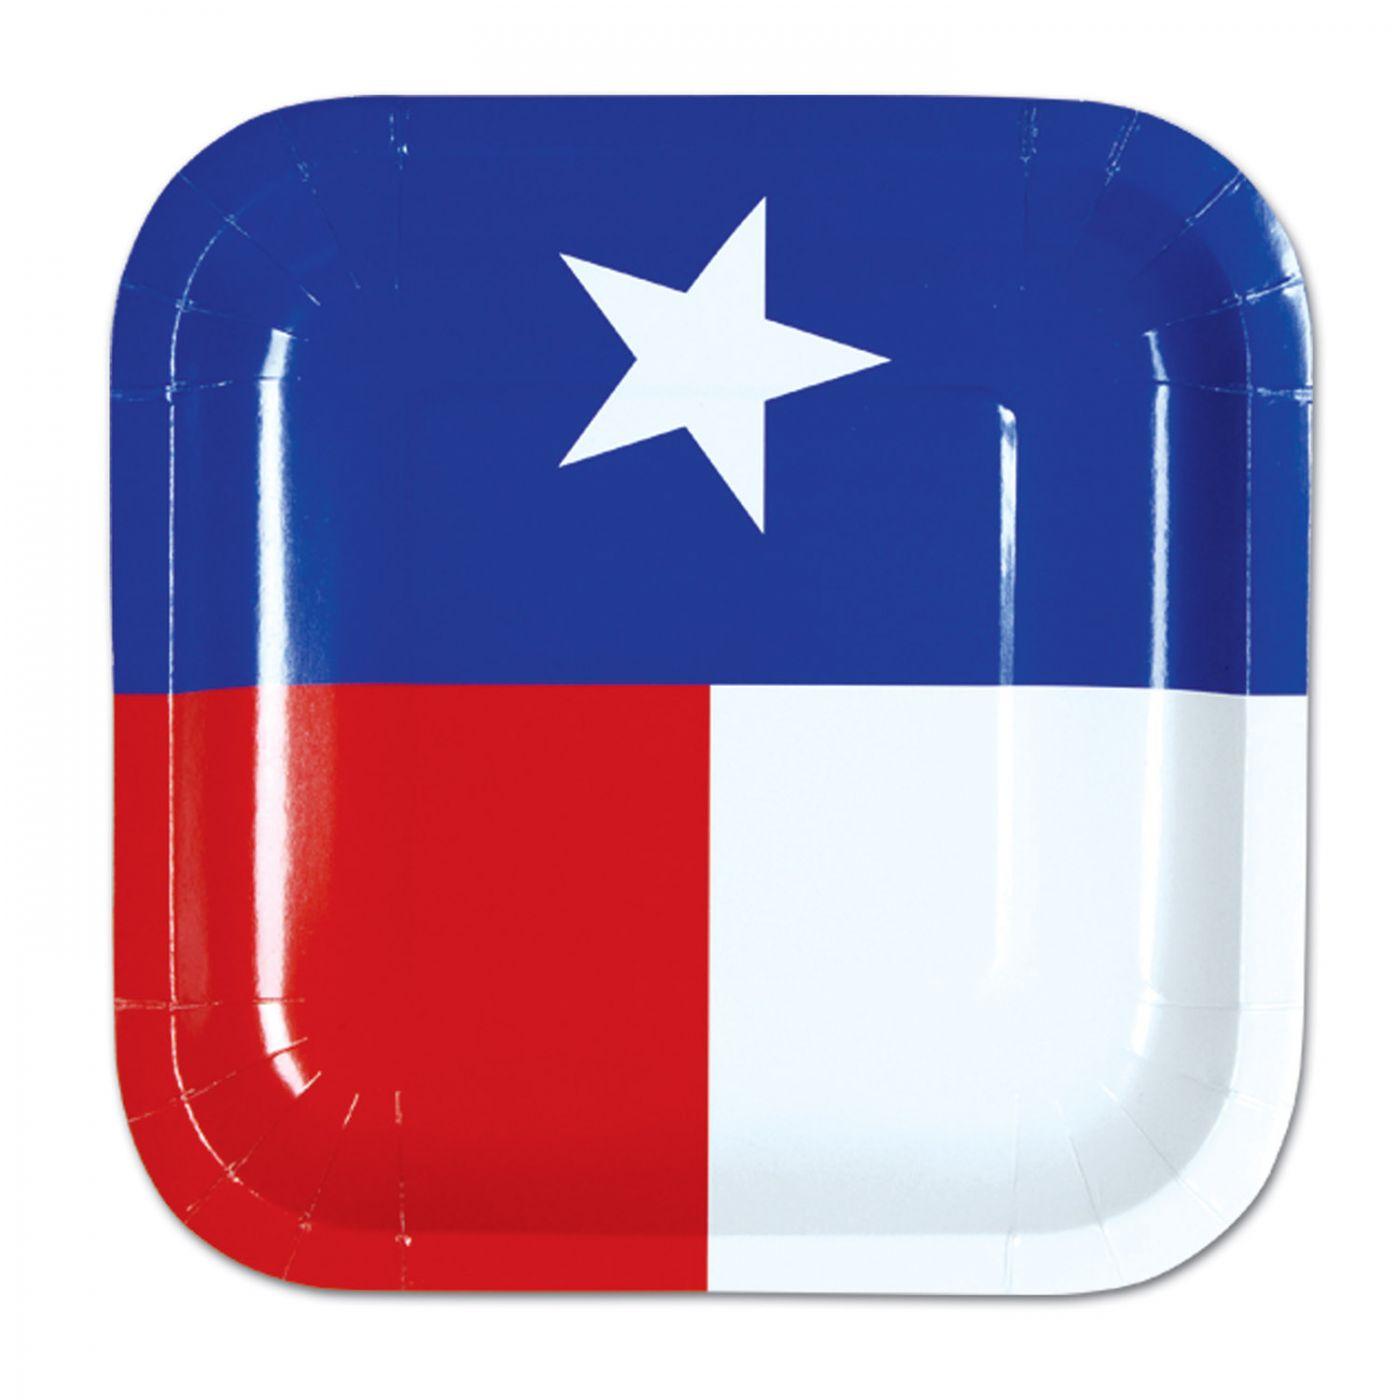 Texas Plates image